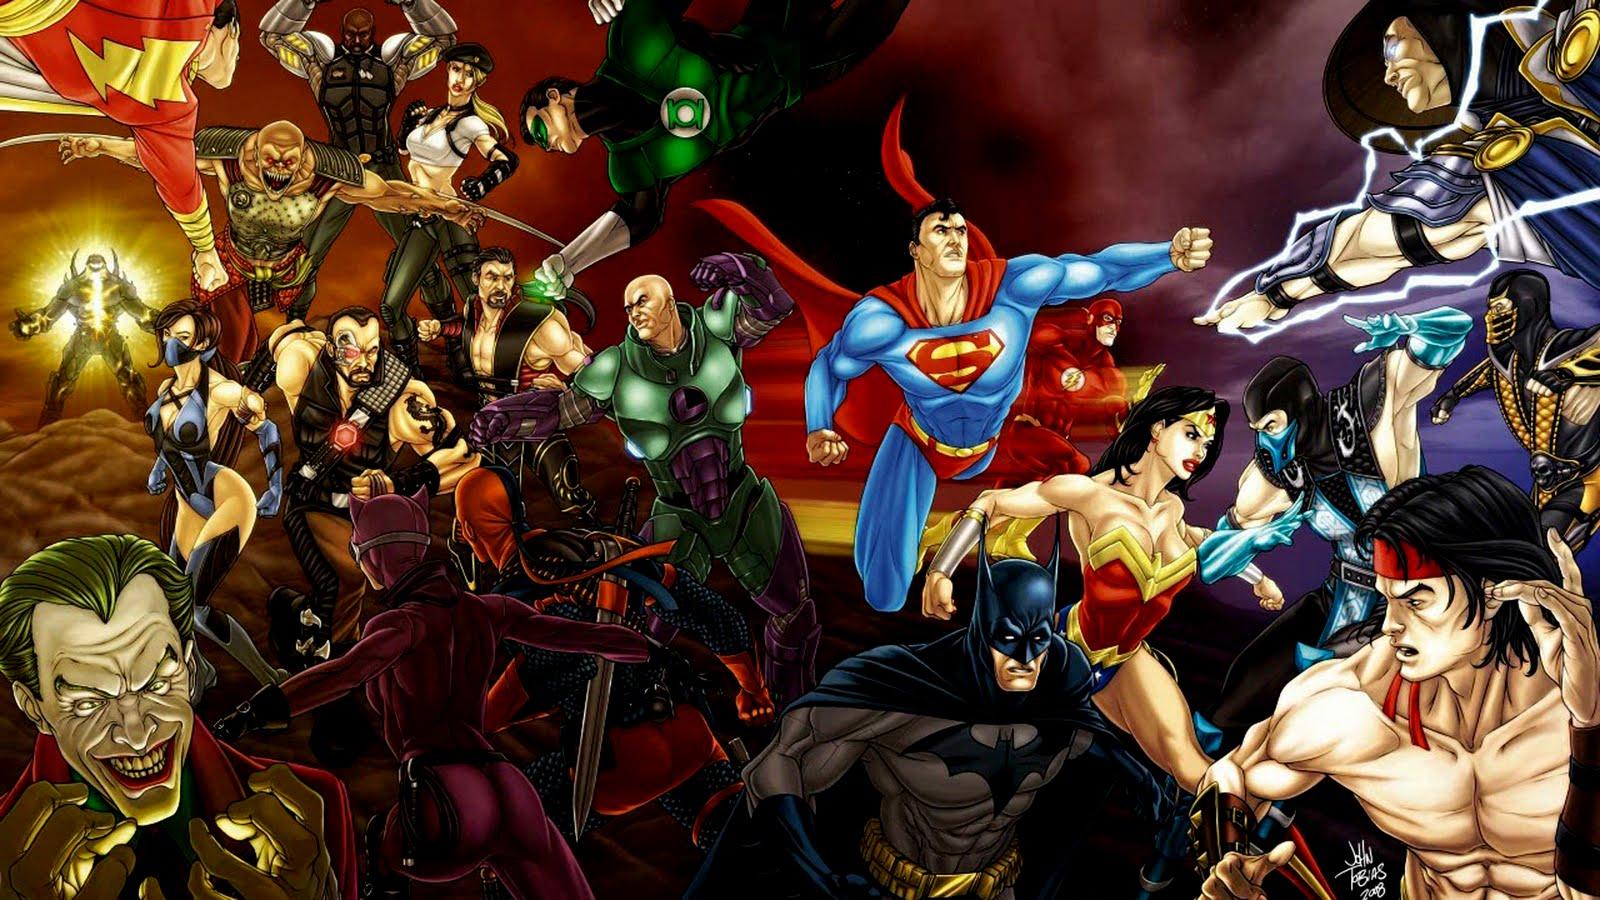 DC Comics All Characters HD Desktop Wallpapers Cartoon Wallpapers 1600x900